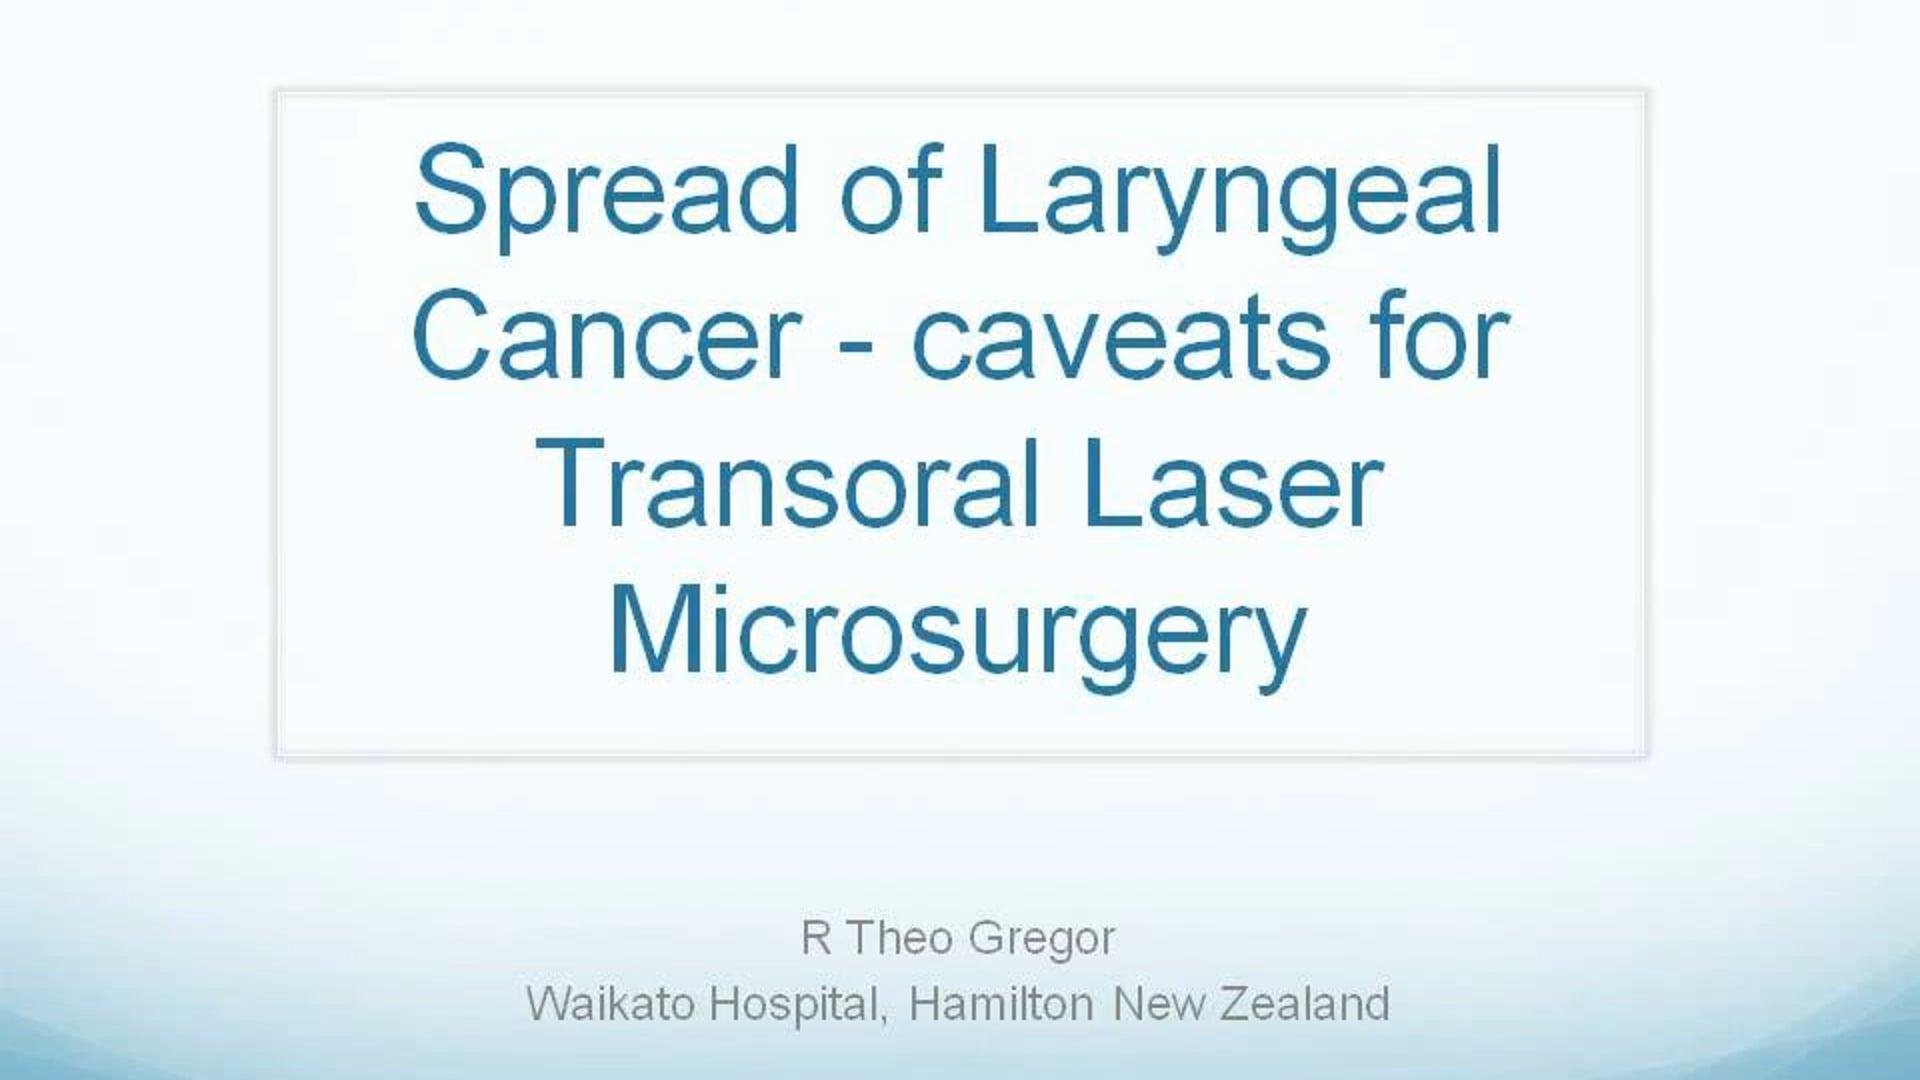 Spread of Laryngeal Cancer & Laser Microsurgery